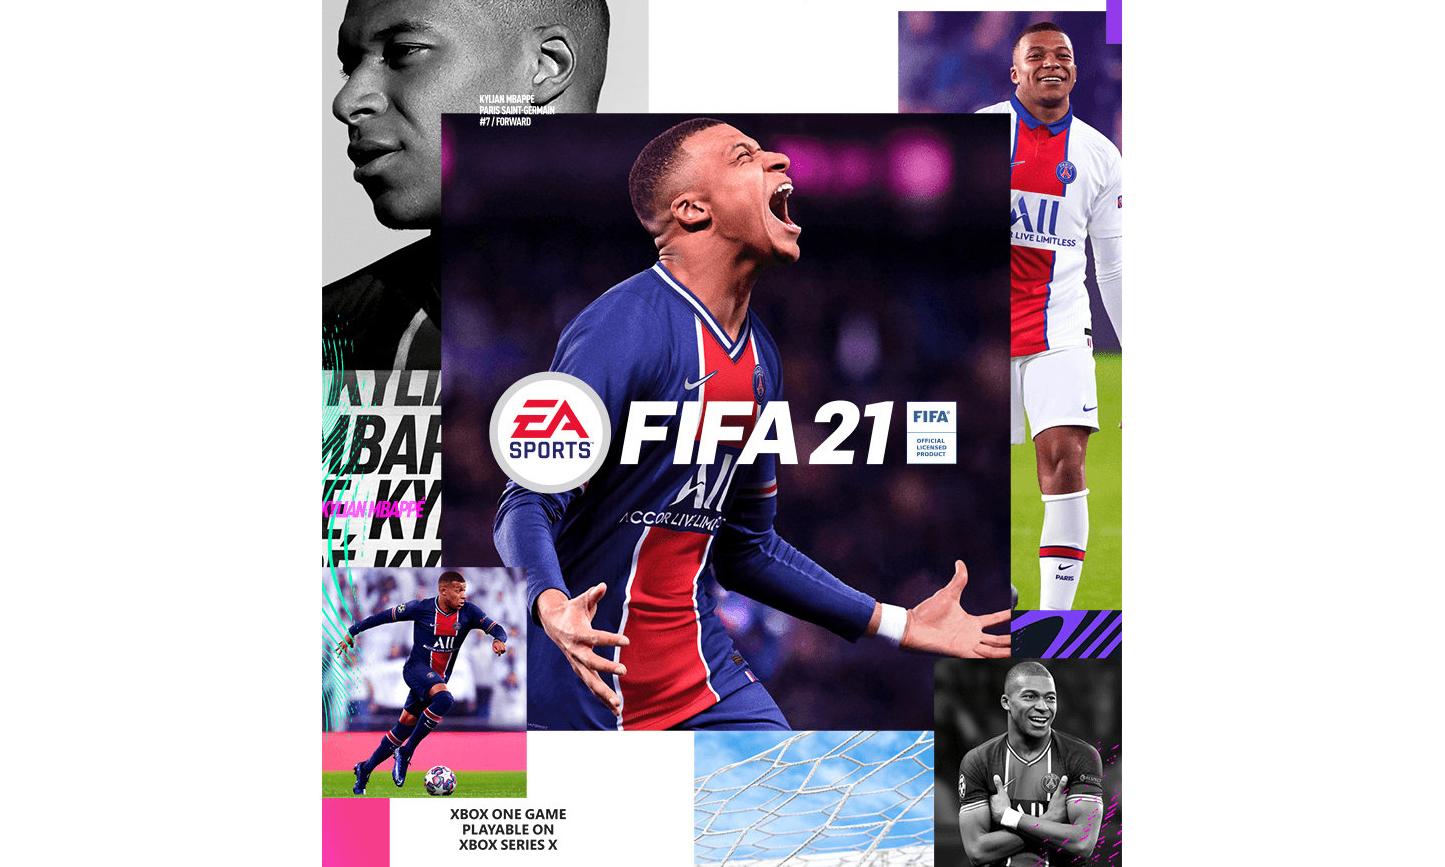 FIFA 21 PS4(5) ULTIMATE TEAM DLC Дополнение игроки